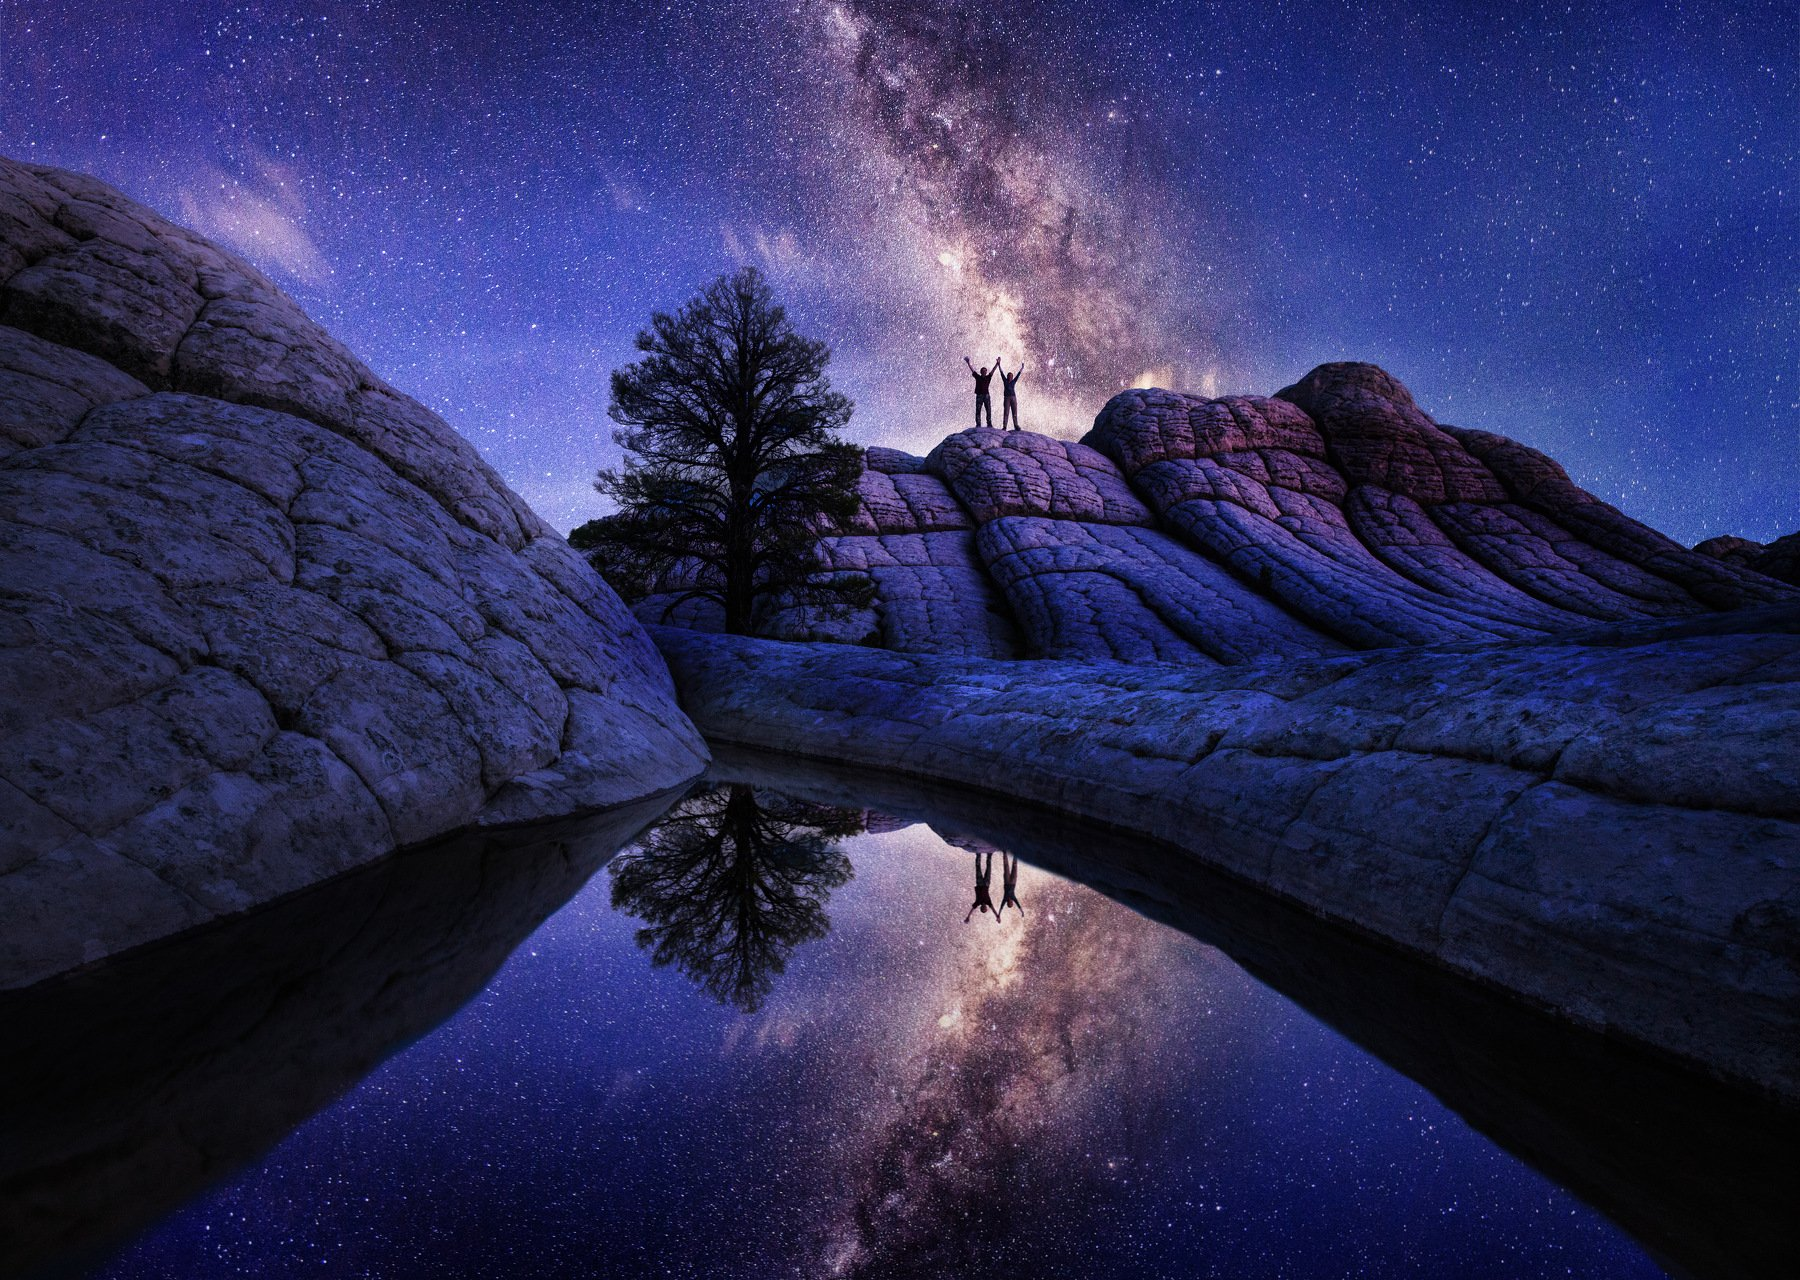 США, Аризона, Белый карман,USA, Arizona,  Vermilion Cliffs National Monument, White Pocket , Алексей Сулоев